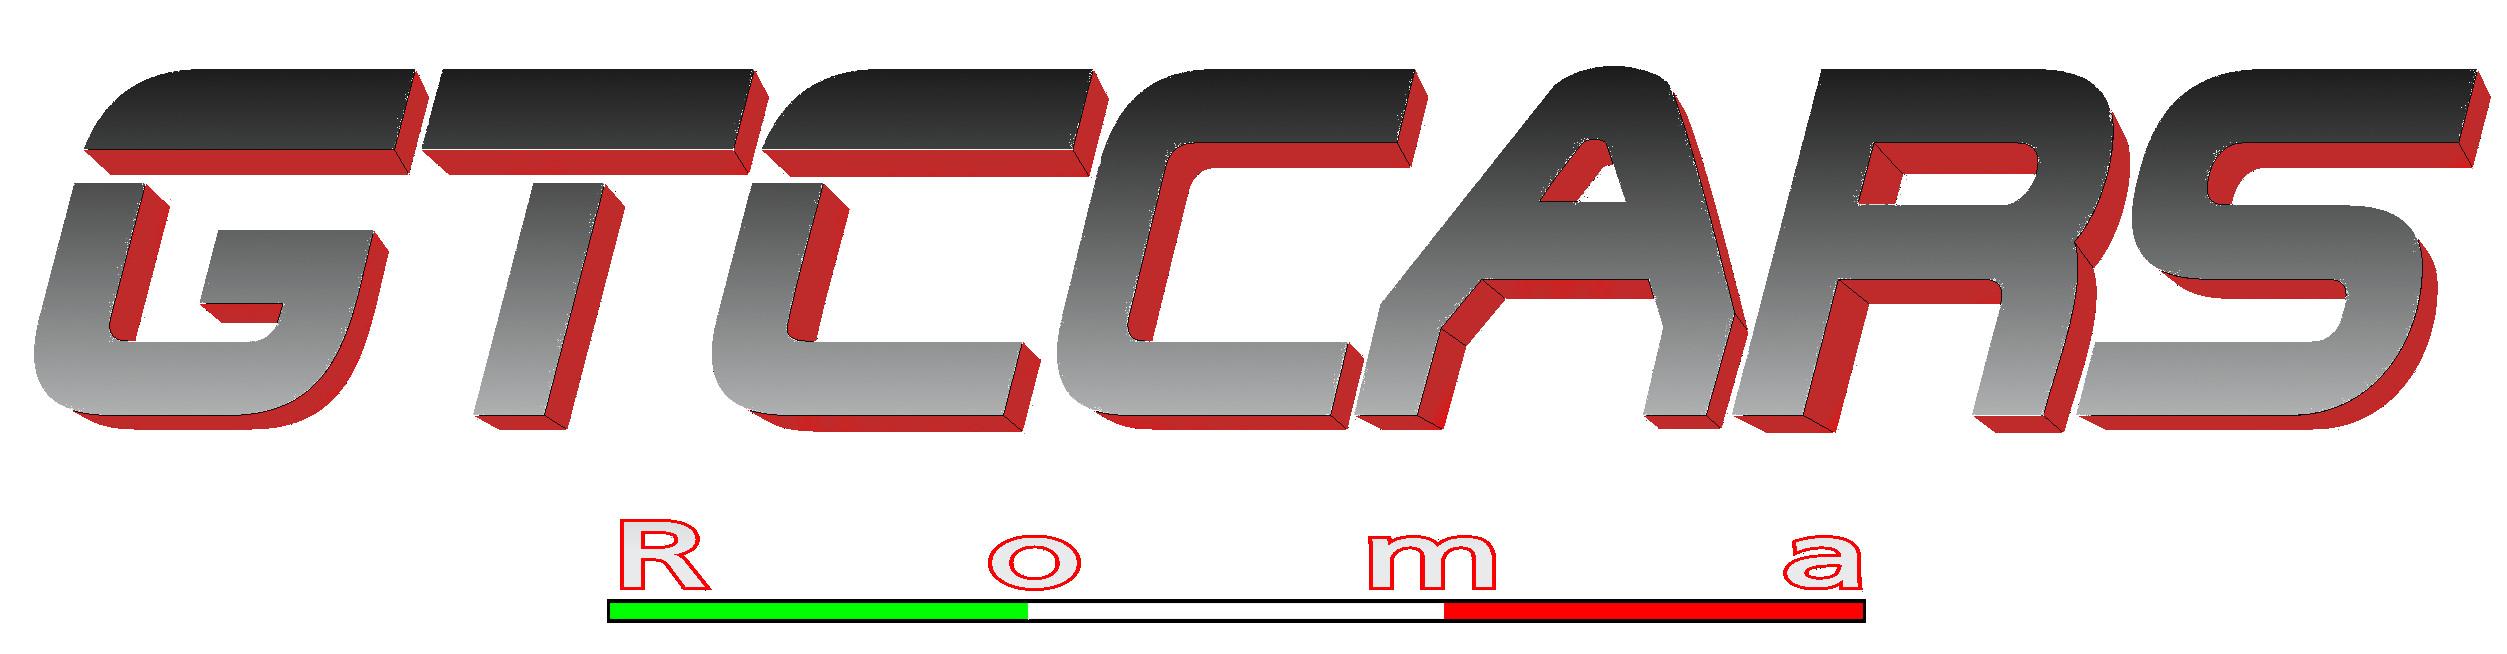 Gtc Cars Roma